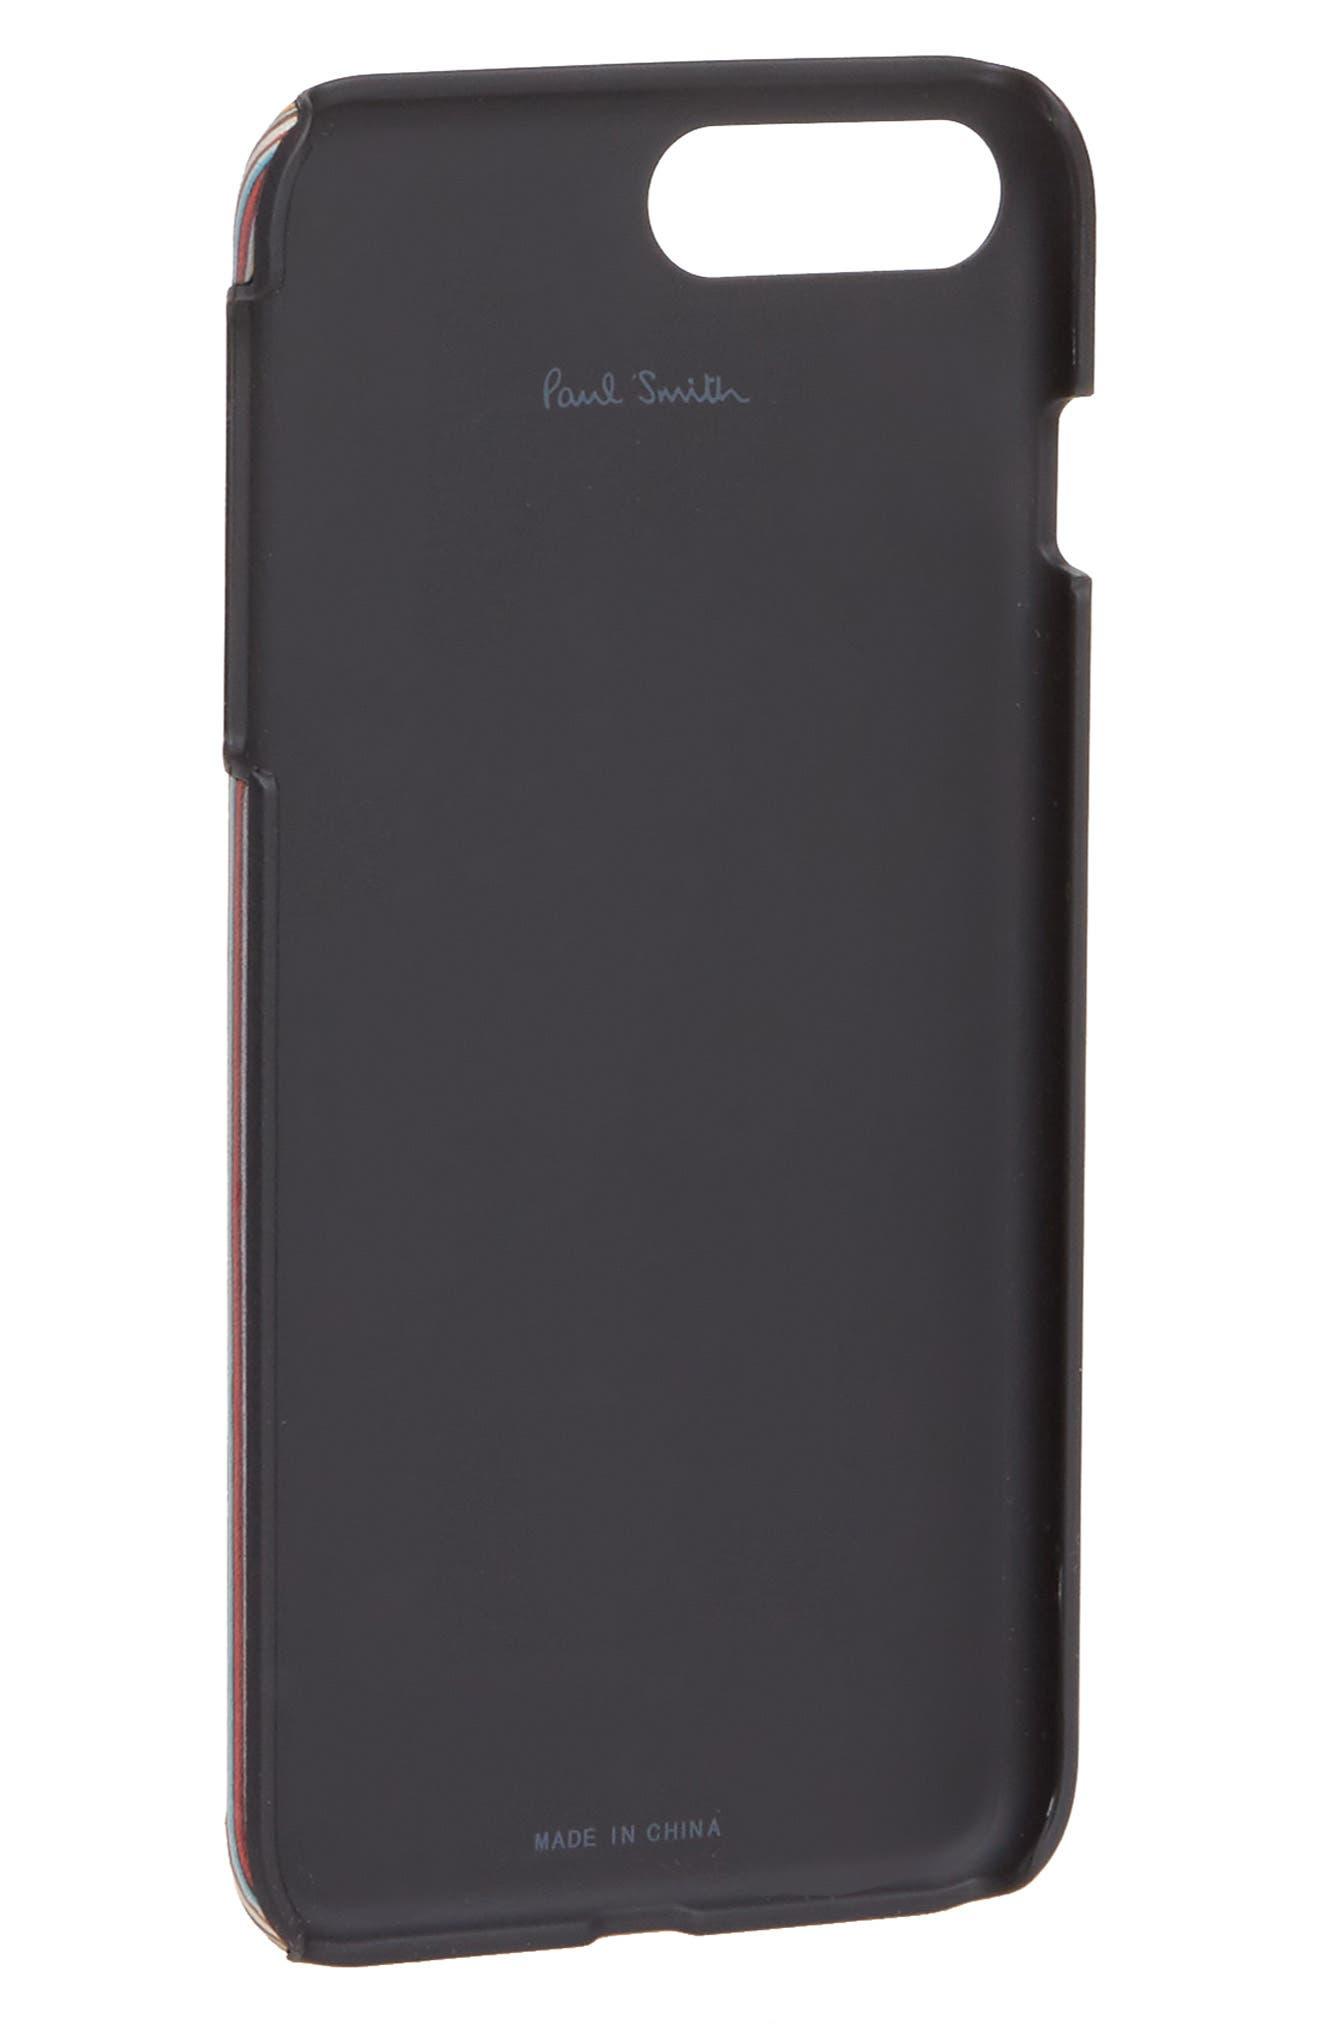 Multistripe iPhone 7 Plus/8 Plus Case,                             Alternate thumbnail 2, color,                             001